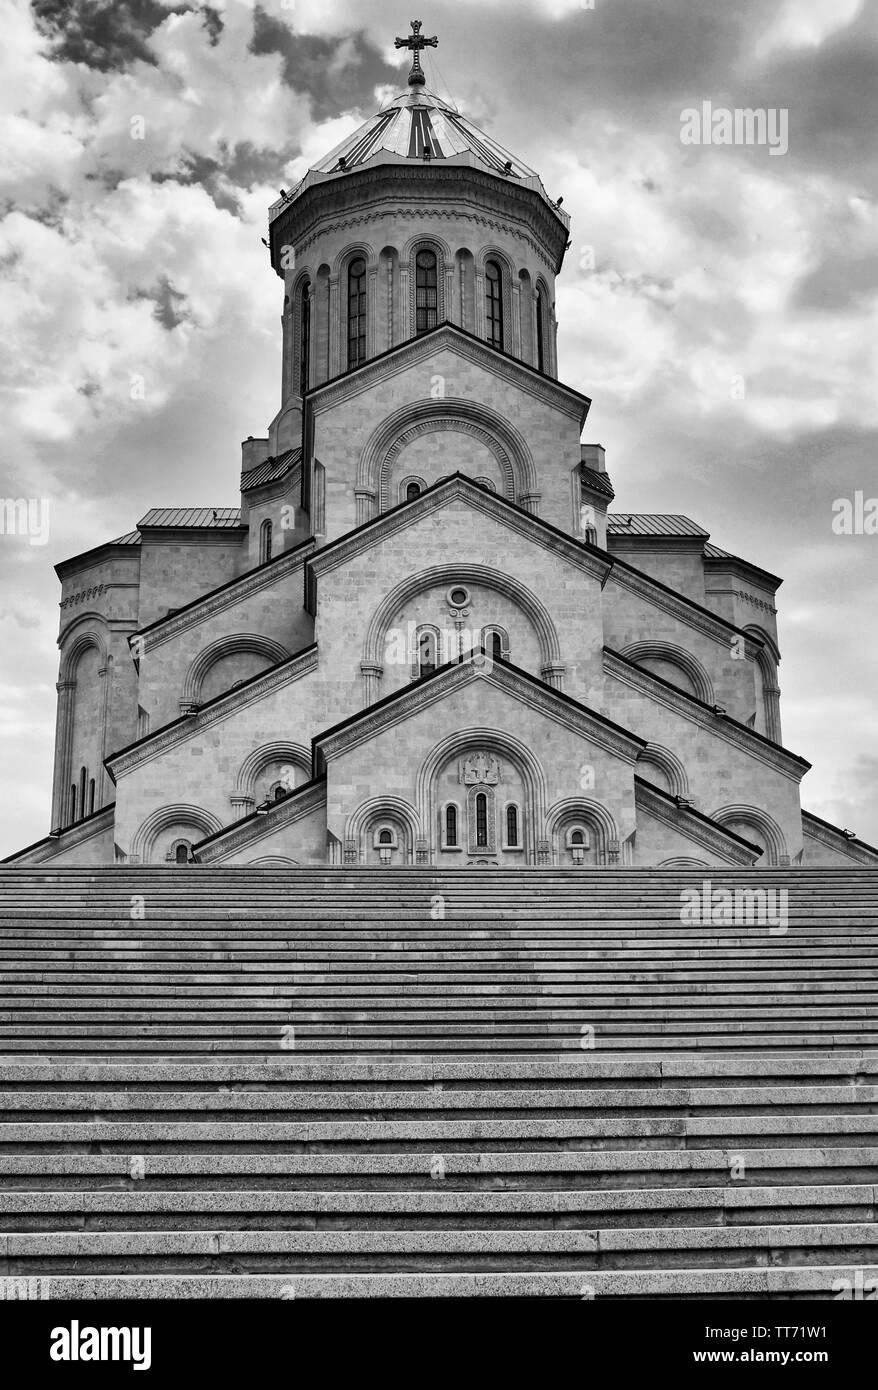 TBILISI, GEORGIA - JUNE 29, 2014: Church Zminda Sameba, the new cathedral of Tbilisi on June 29, 2014 in Georgia, Europe - Stock Image